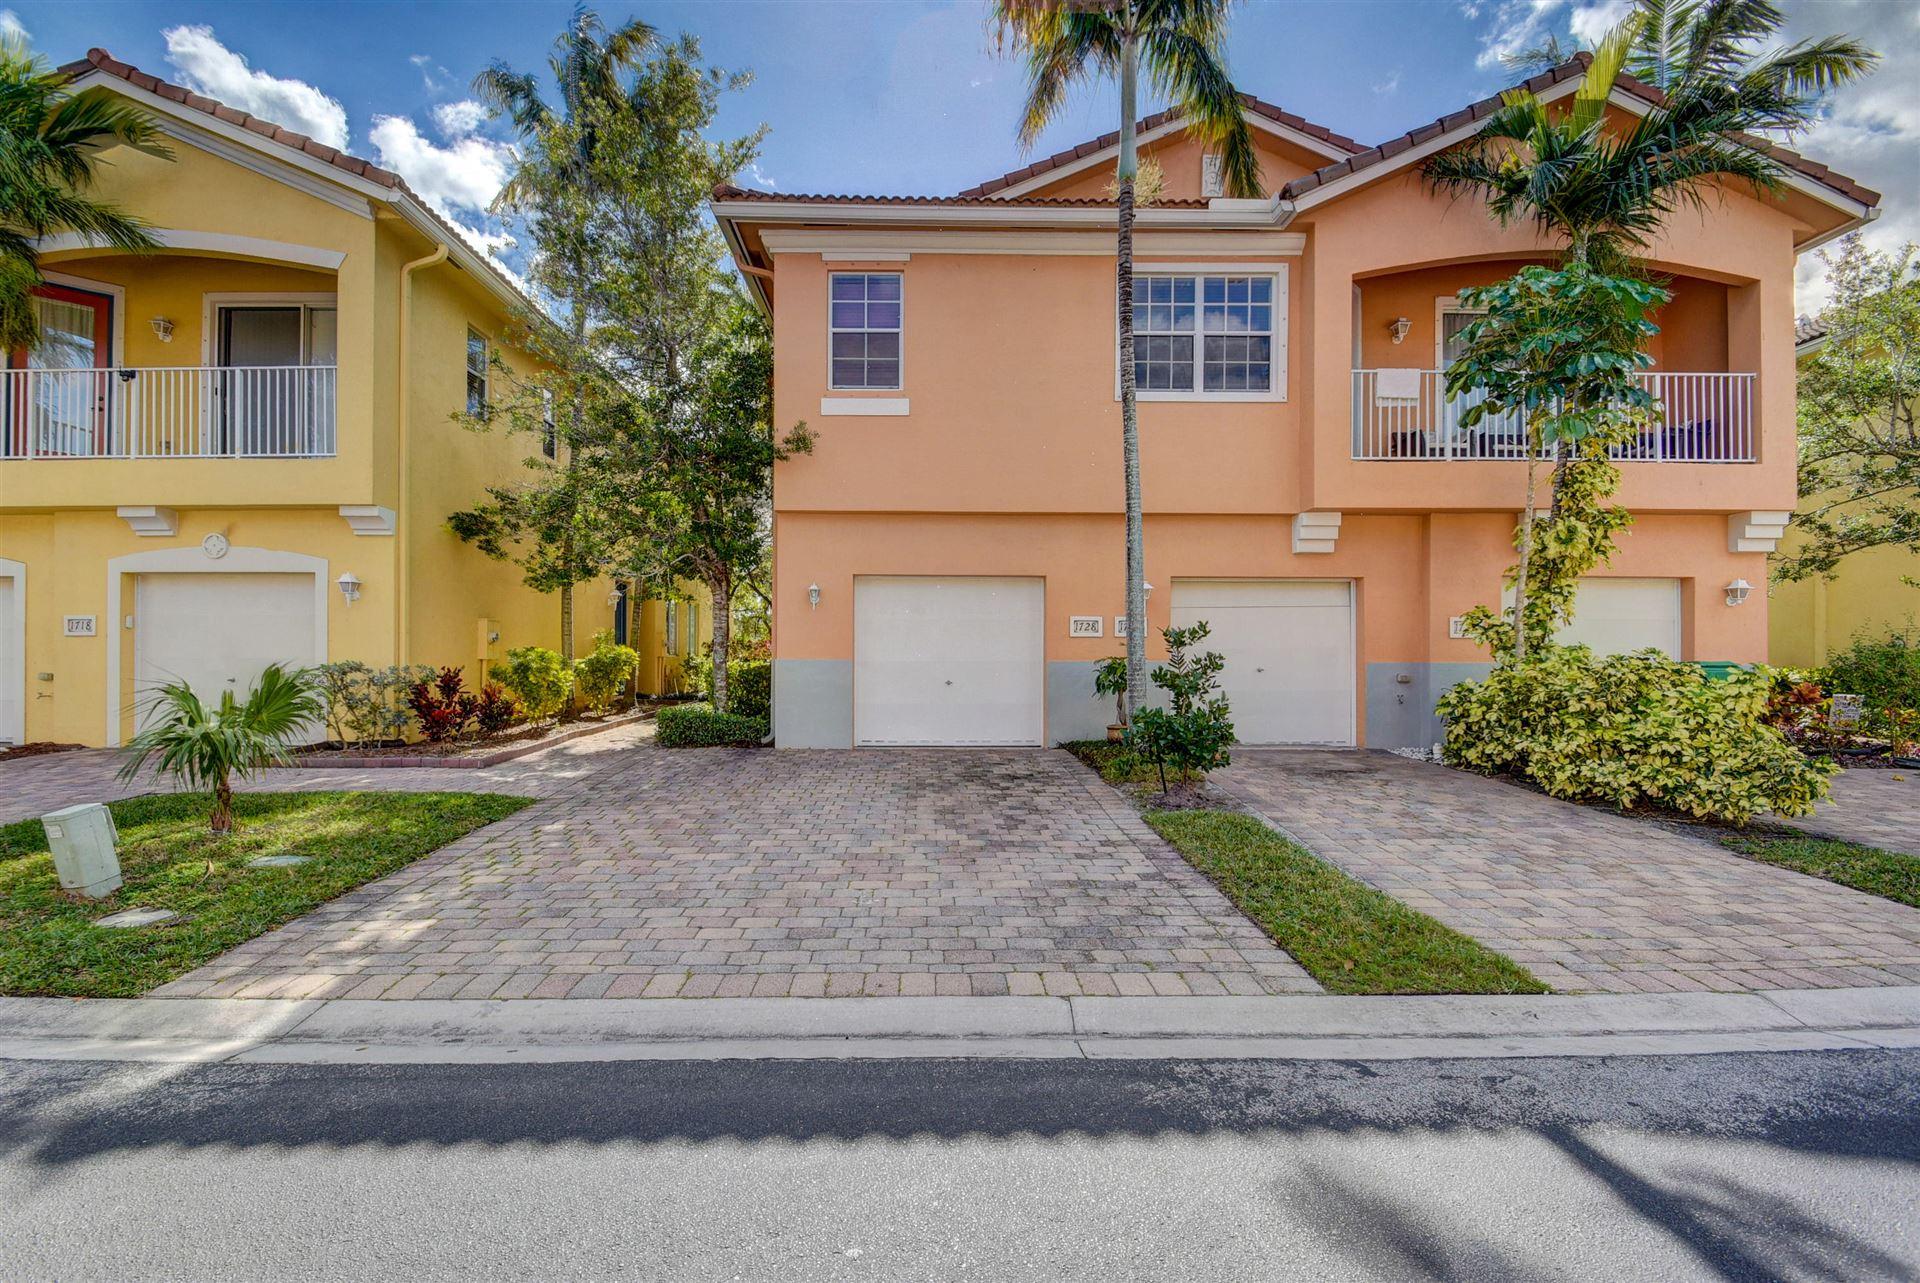 1728 Carvelle Drive, Riviera Beach, FL 33404 - #: RX-10685827